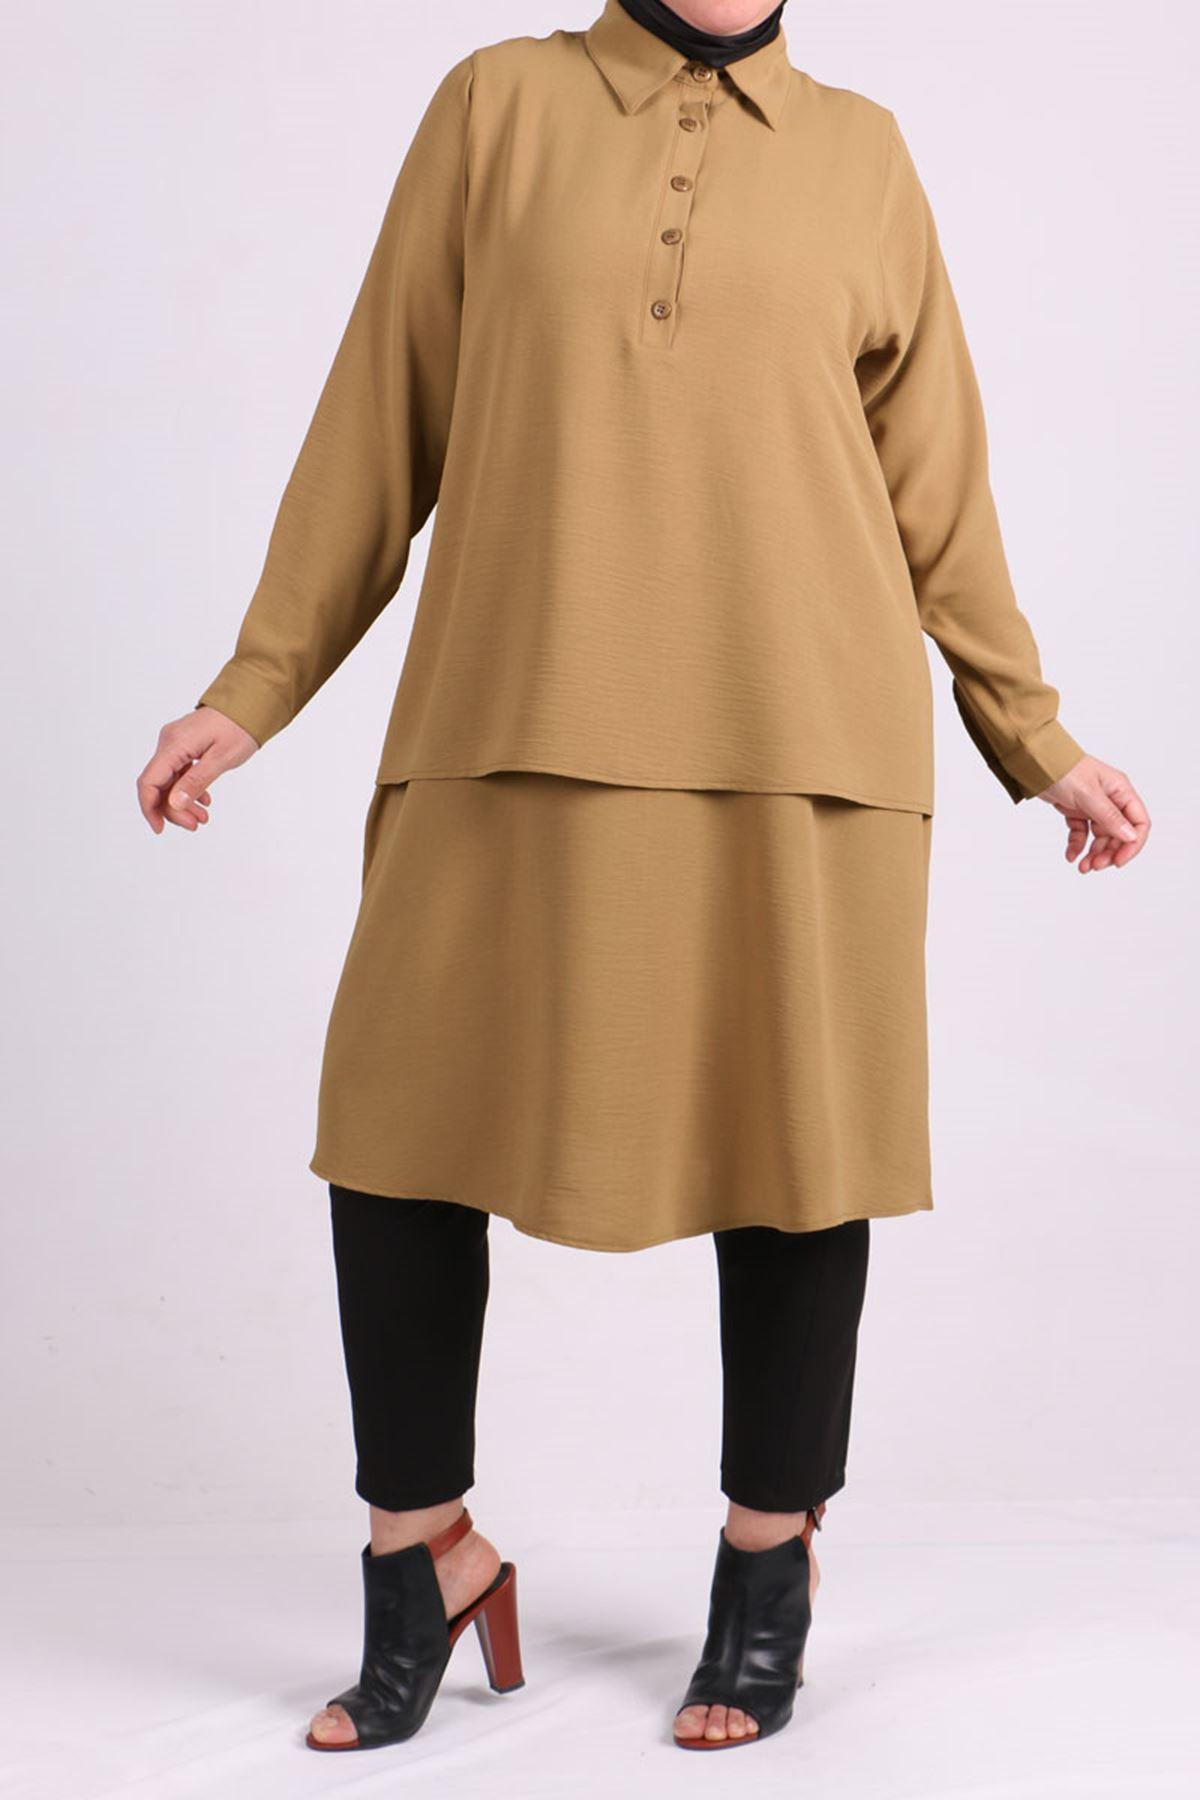 8443 Plus Size Tunic- Dark Mink